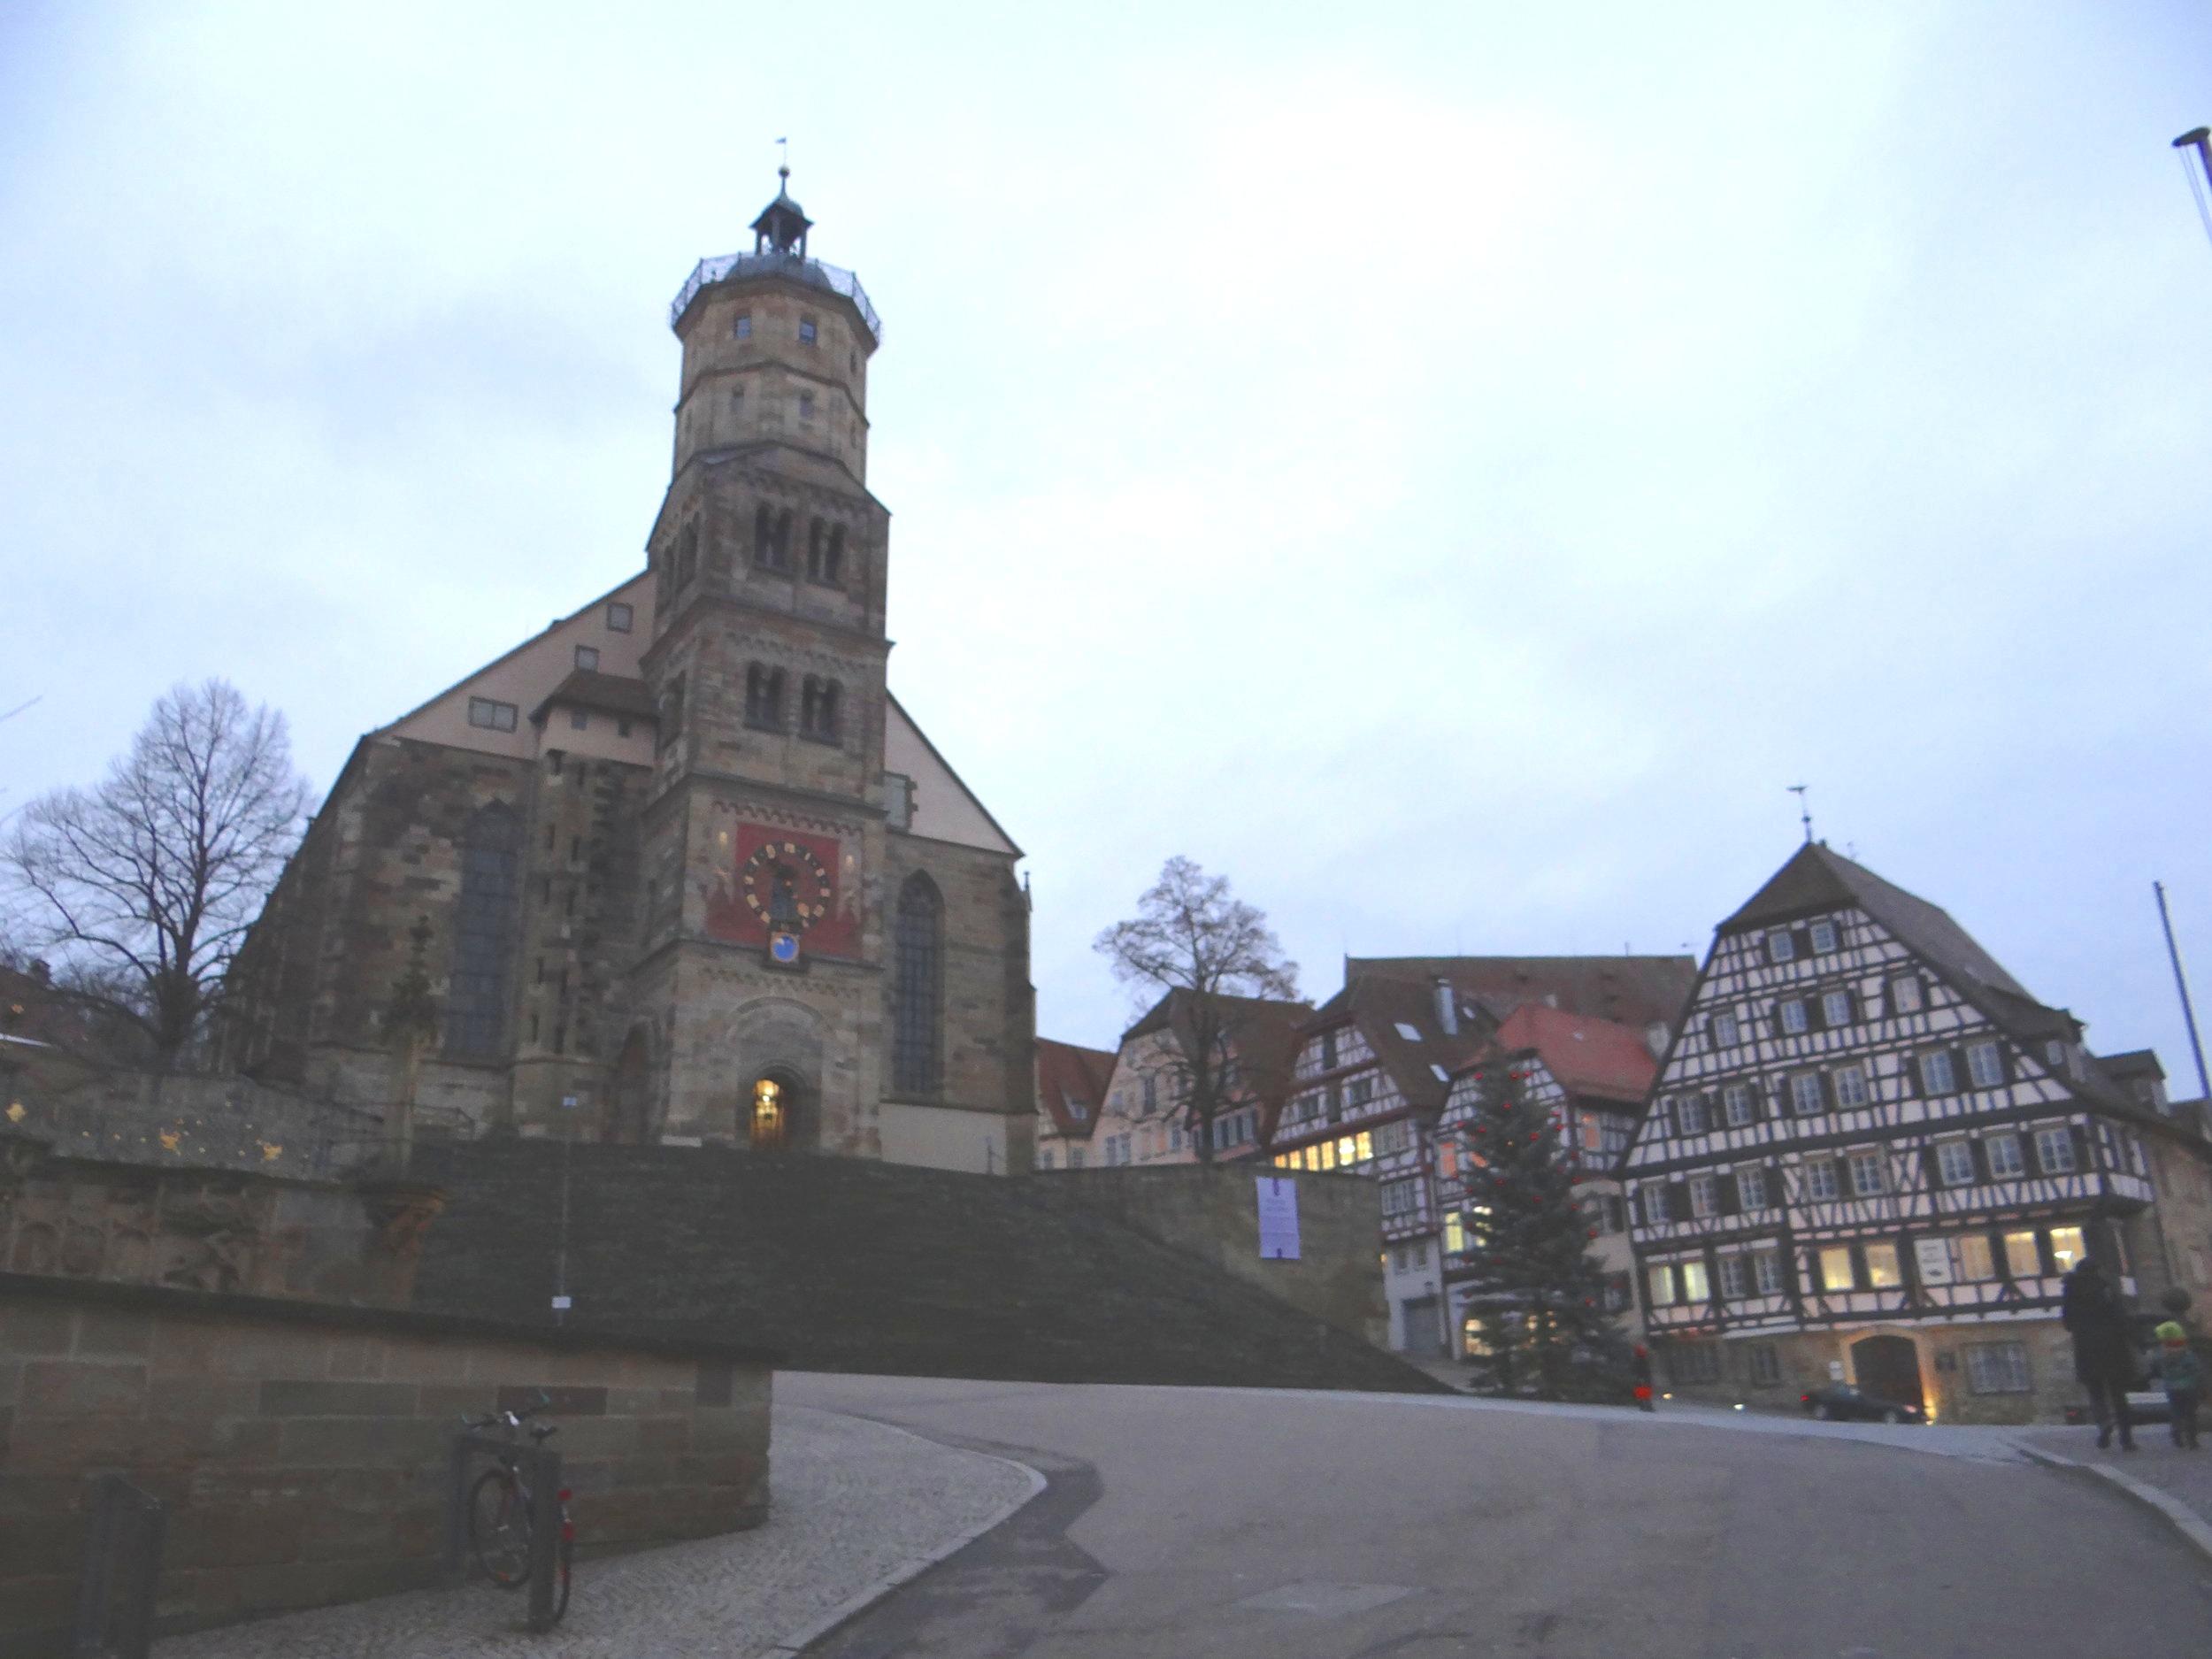 Schwabisch Hall Marktplatz and Saint Michael church in the evening hours